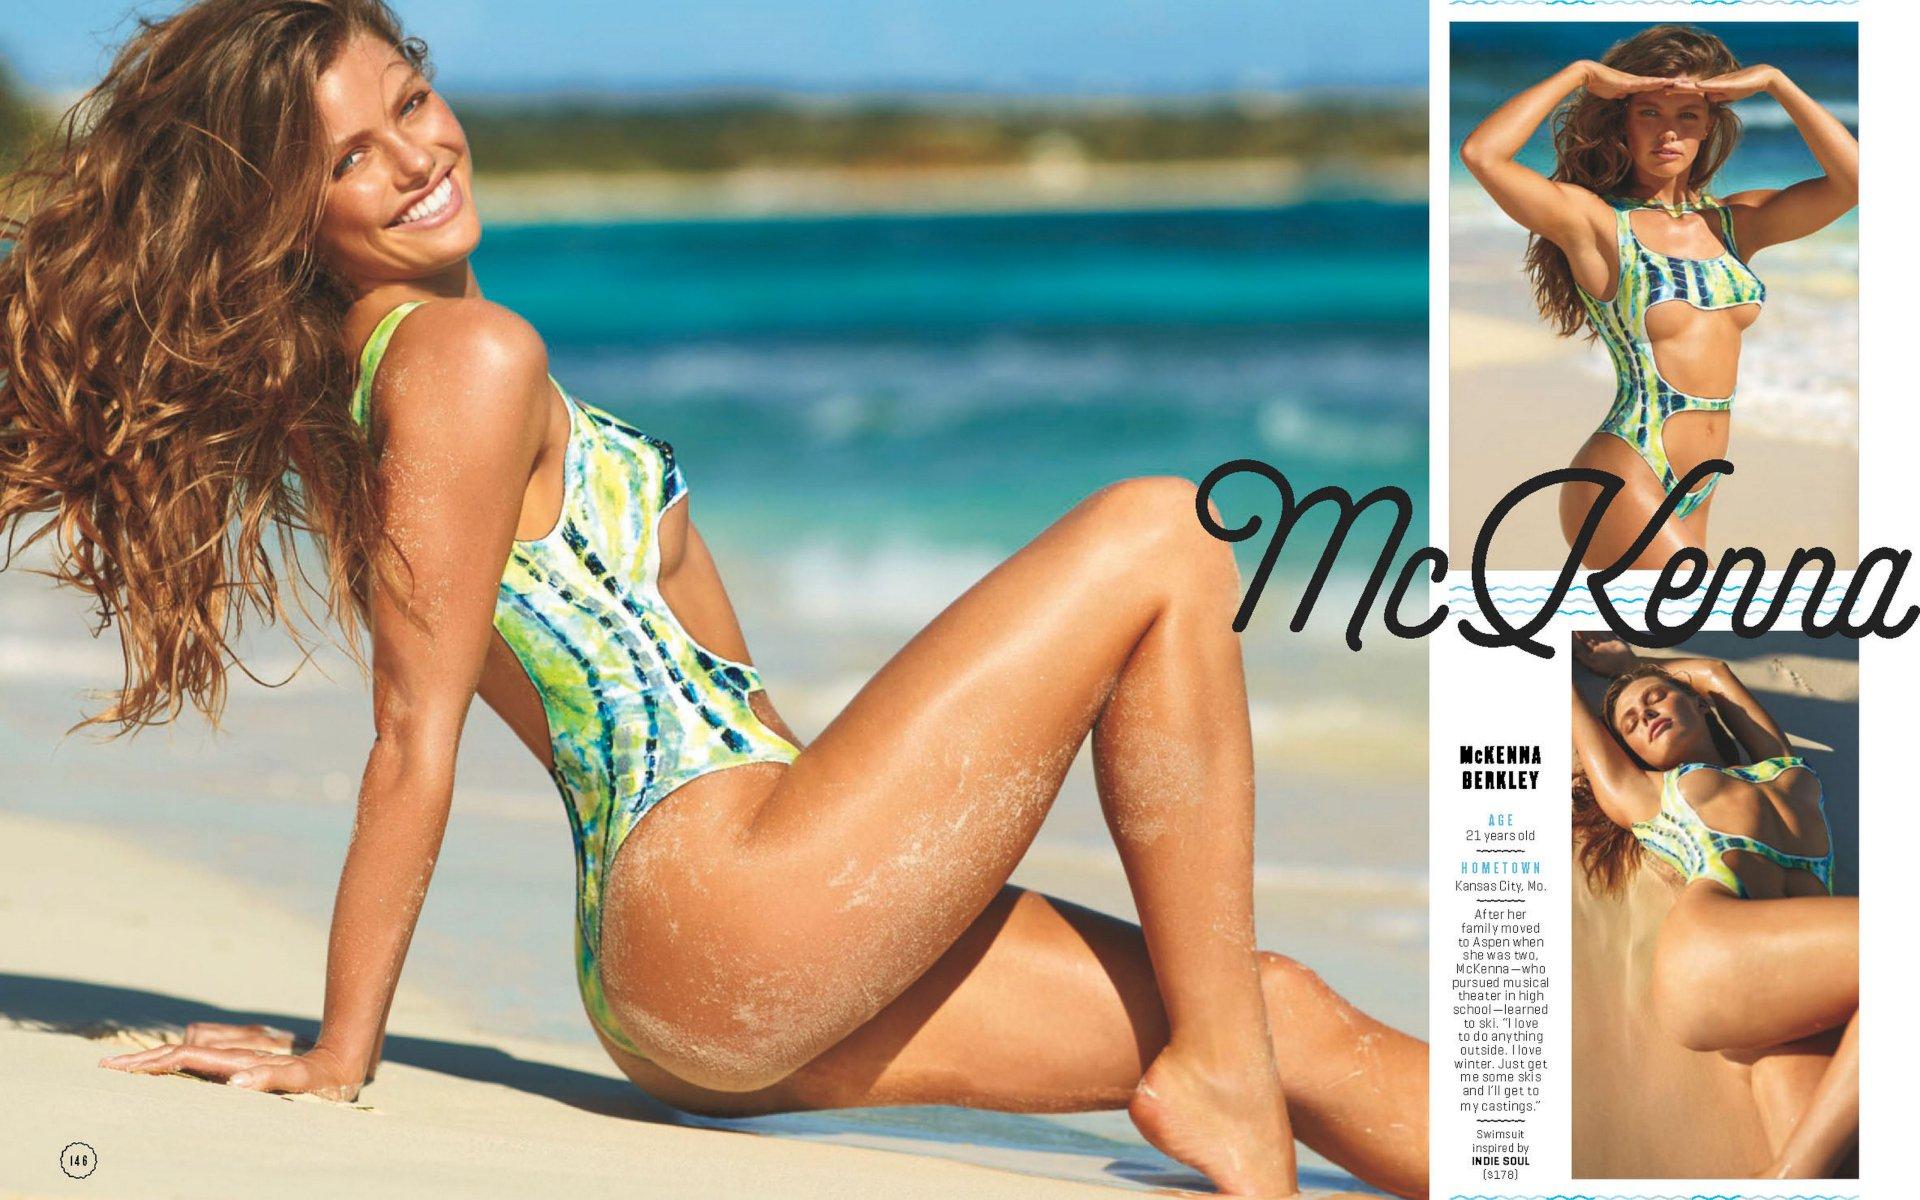 Chrissy Teigen Poses Nude in Sexy Beach Shoot (39 photos